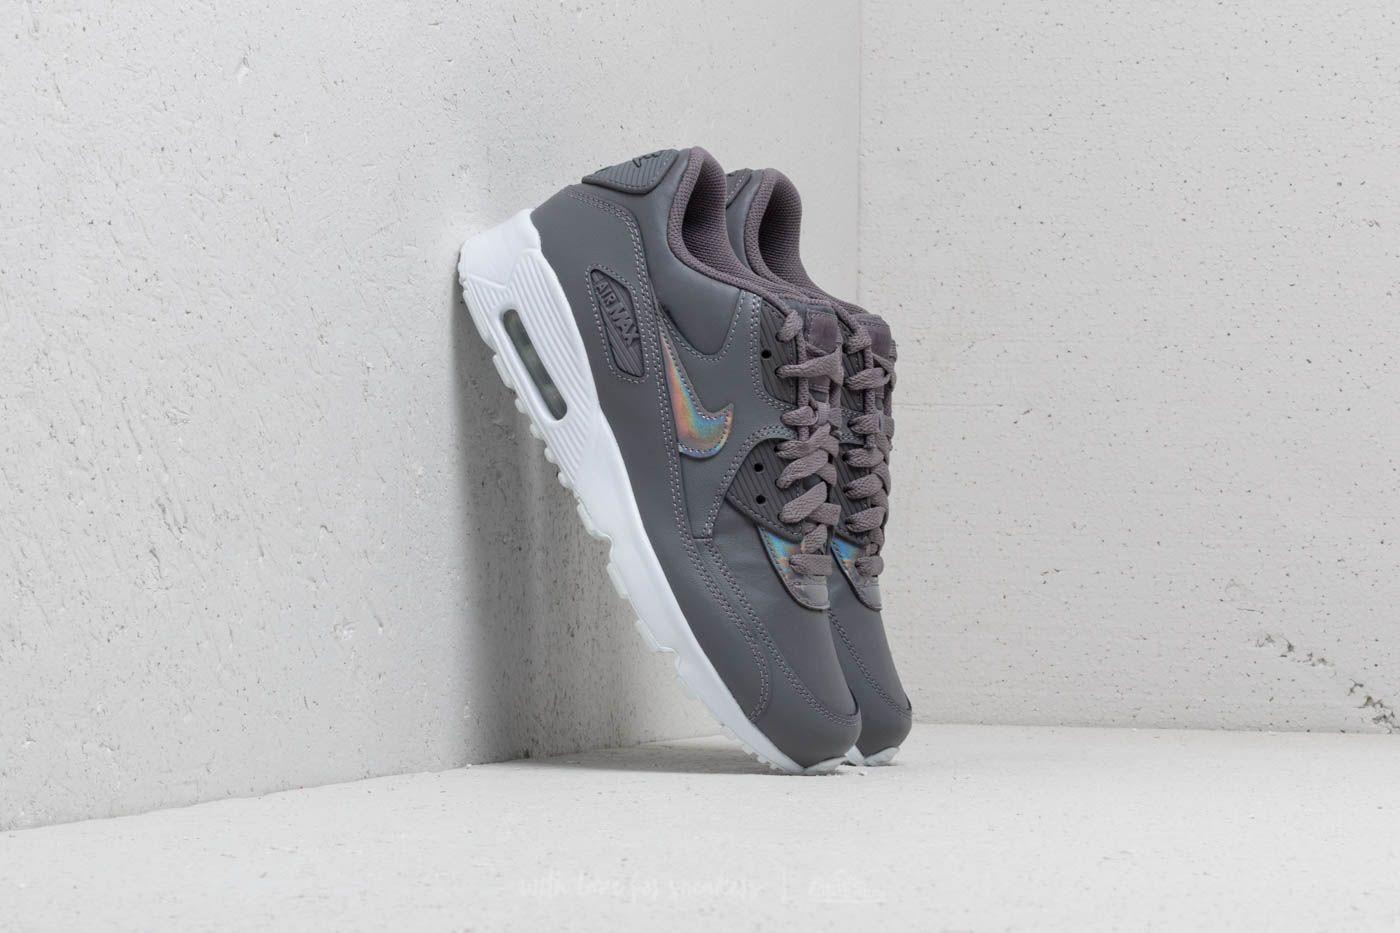 Dlouhodobá recenze tenisek Nike Air Max 90 Leather - zkušenosti ... 7fe1e3e7565